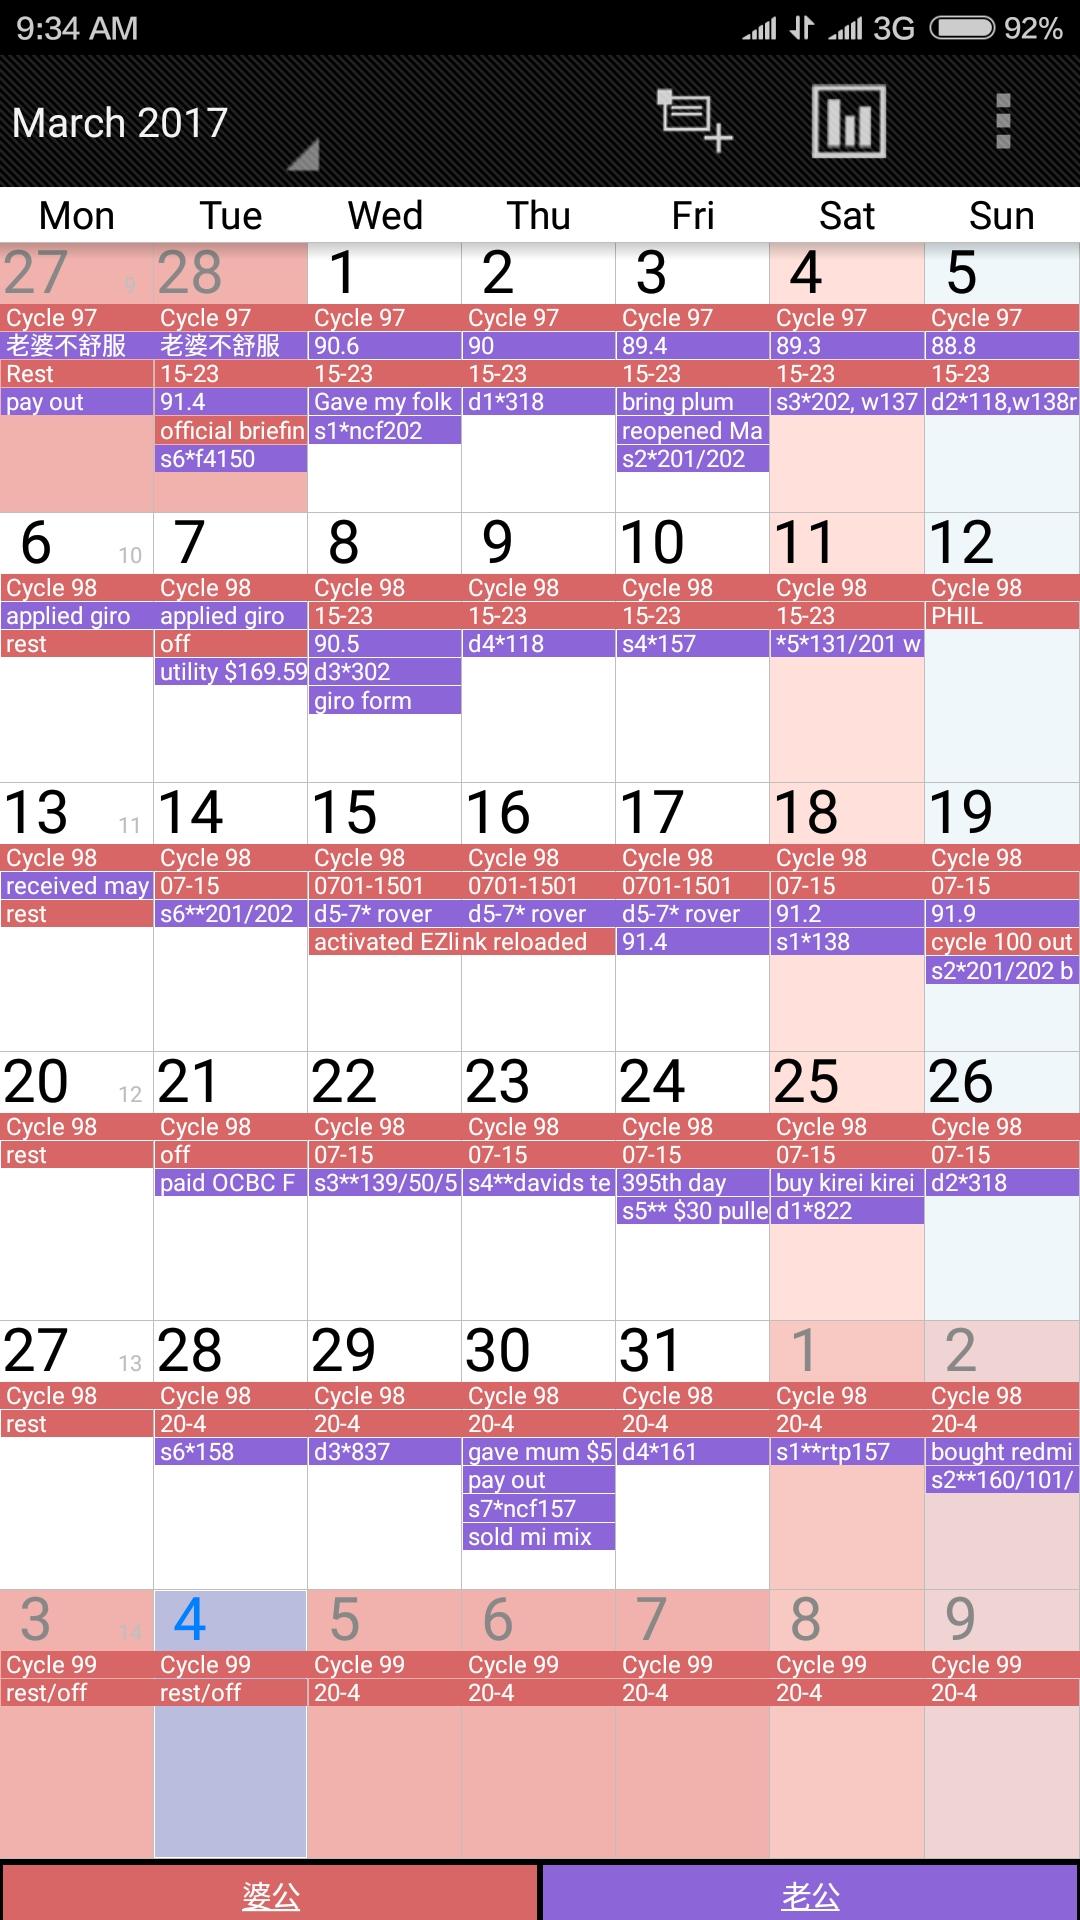 Xiaomi Mi Max - Part 2 - Page 154 - Www.hardwarezone.sg